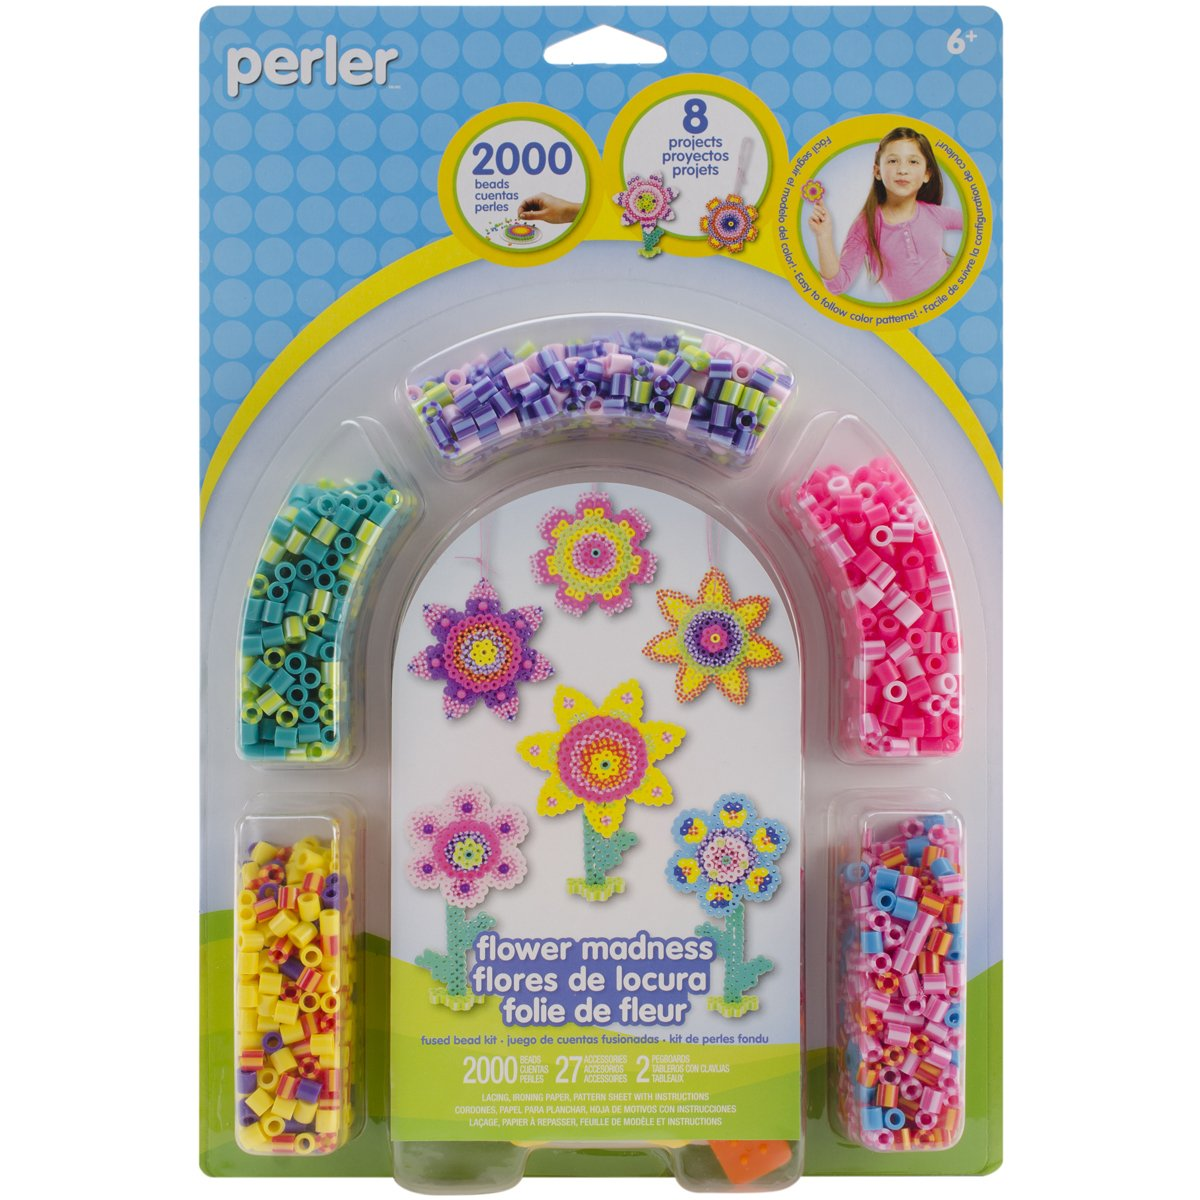 Perler Beads 'Flower Madness' Fuse Bead Activity Kit for Kids, 2029 pcs